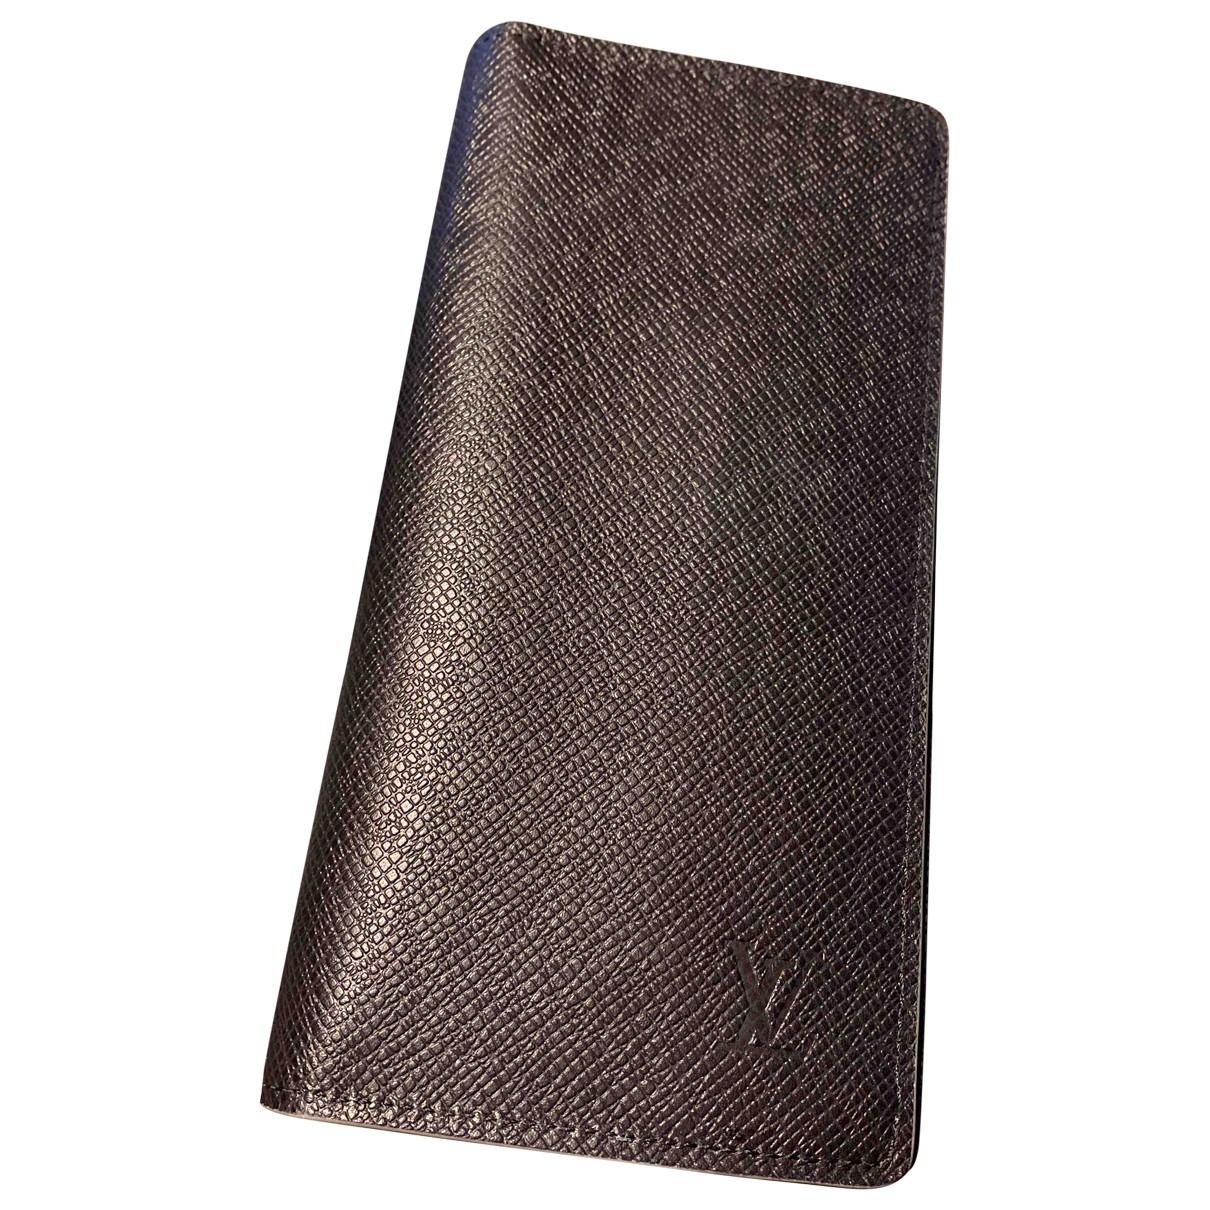 Louis Vuitton Brazza Kleinlederwaren in  Schwarz Leder